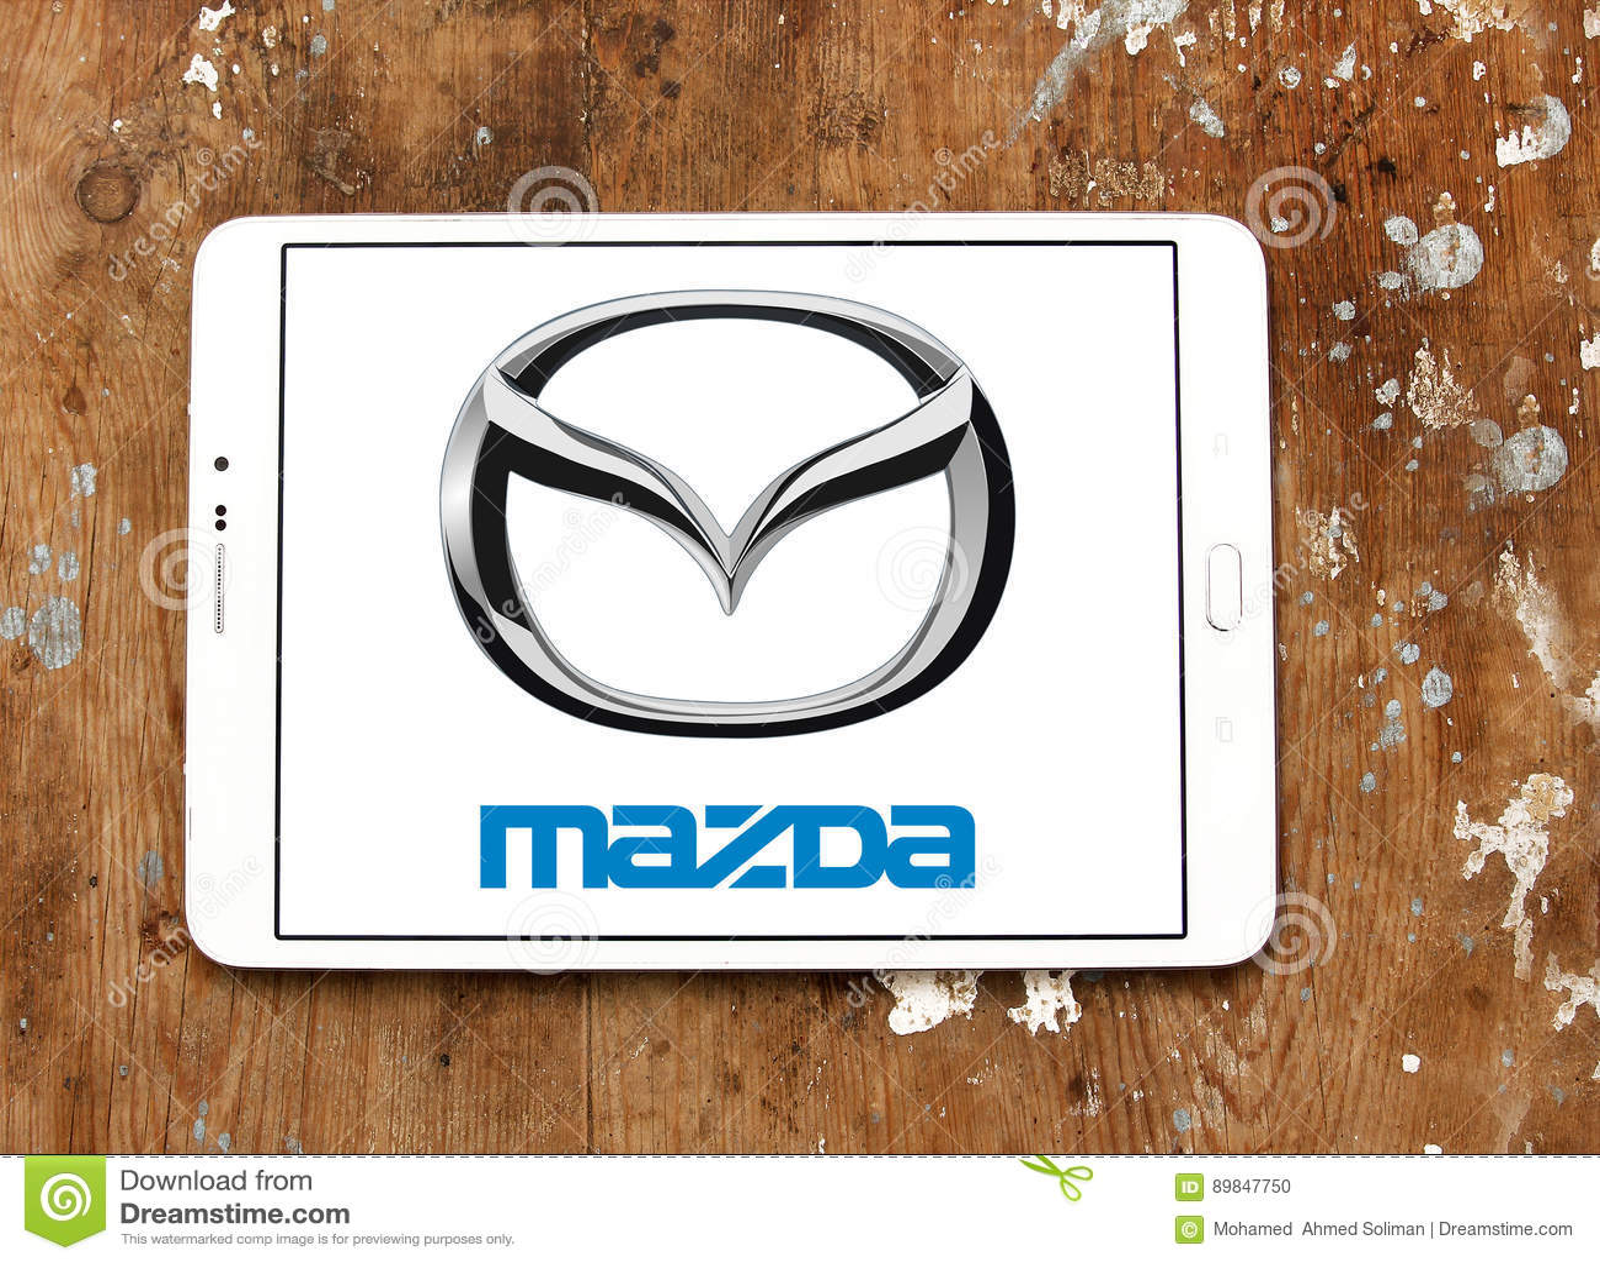 Mazda logo editorial image image of motors cars phone 89847750 mazda logo biocorpaavc Choice Image